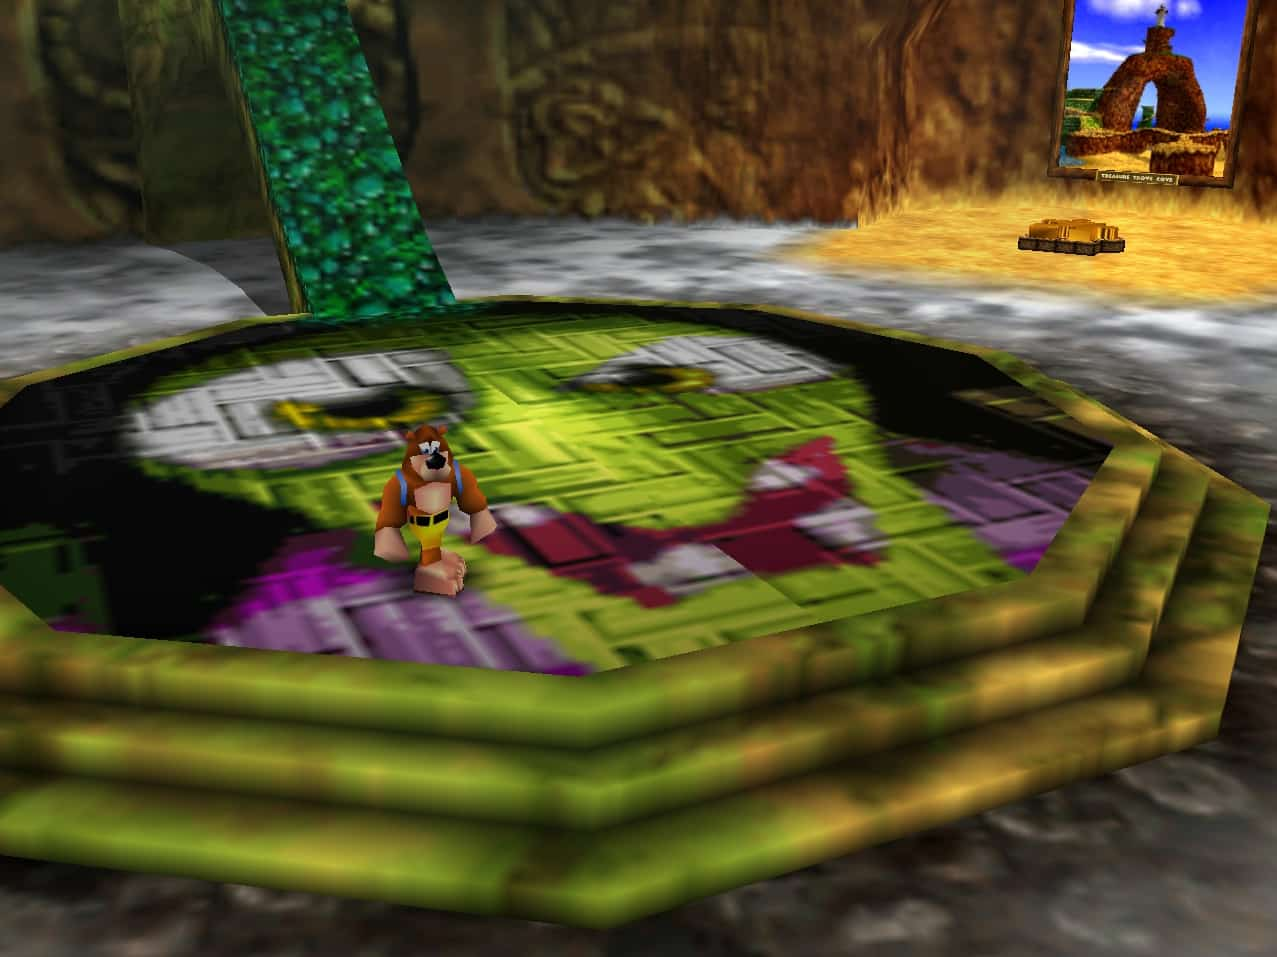 Banjo-Kazooie Rare perfect hub world Gruntilda's Lair